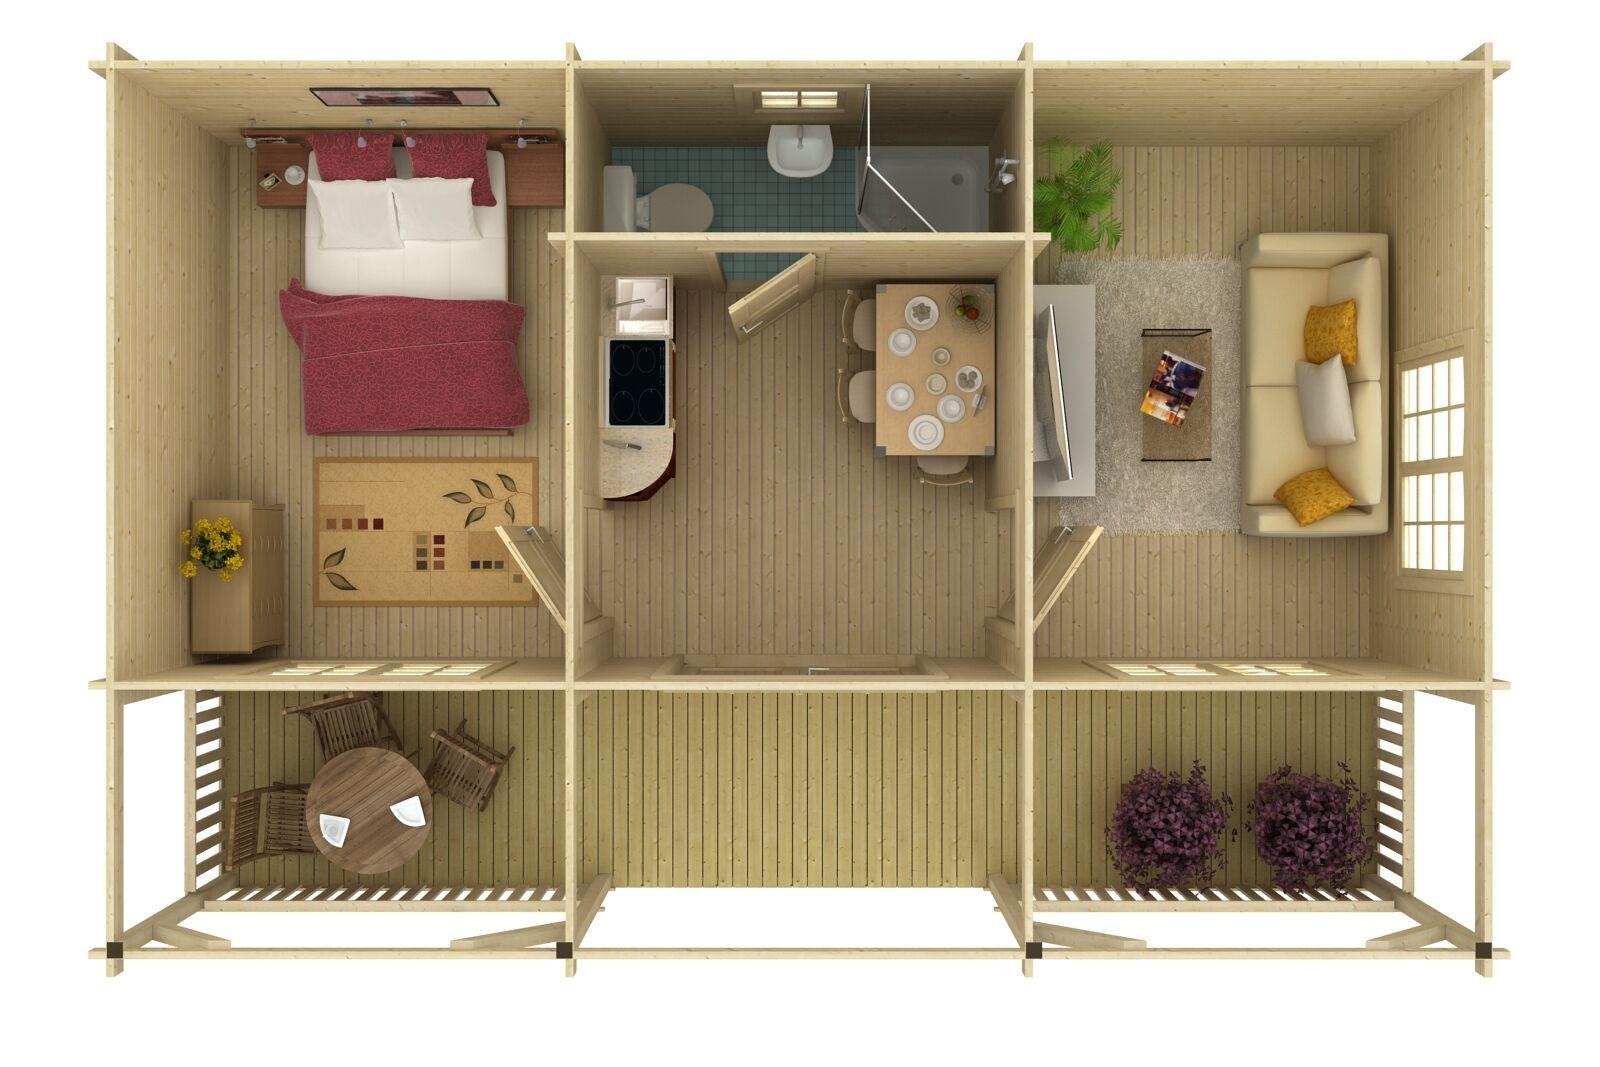 gartenhaus sandra 2 wendy ferienhaus blockhaus holzhaus ca 791x520 cm 44 mm ebay. Black Bedroom Furniture Sets. Home Design Ideas